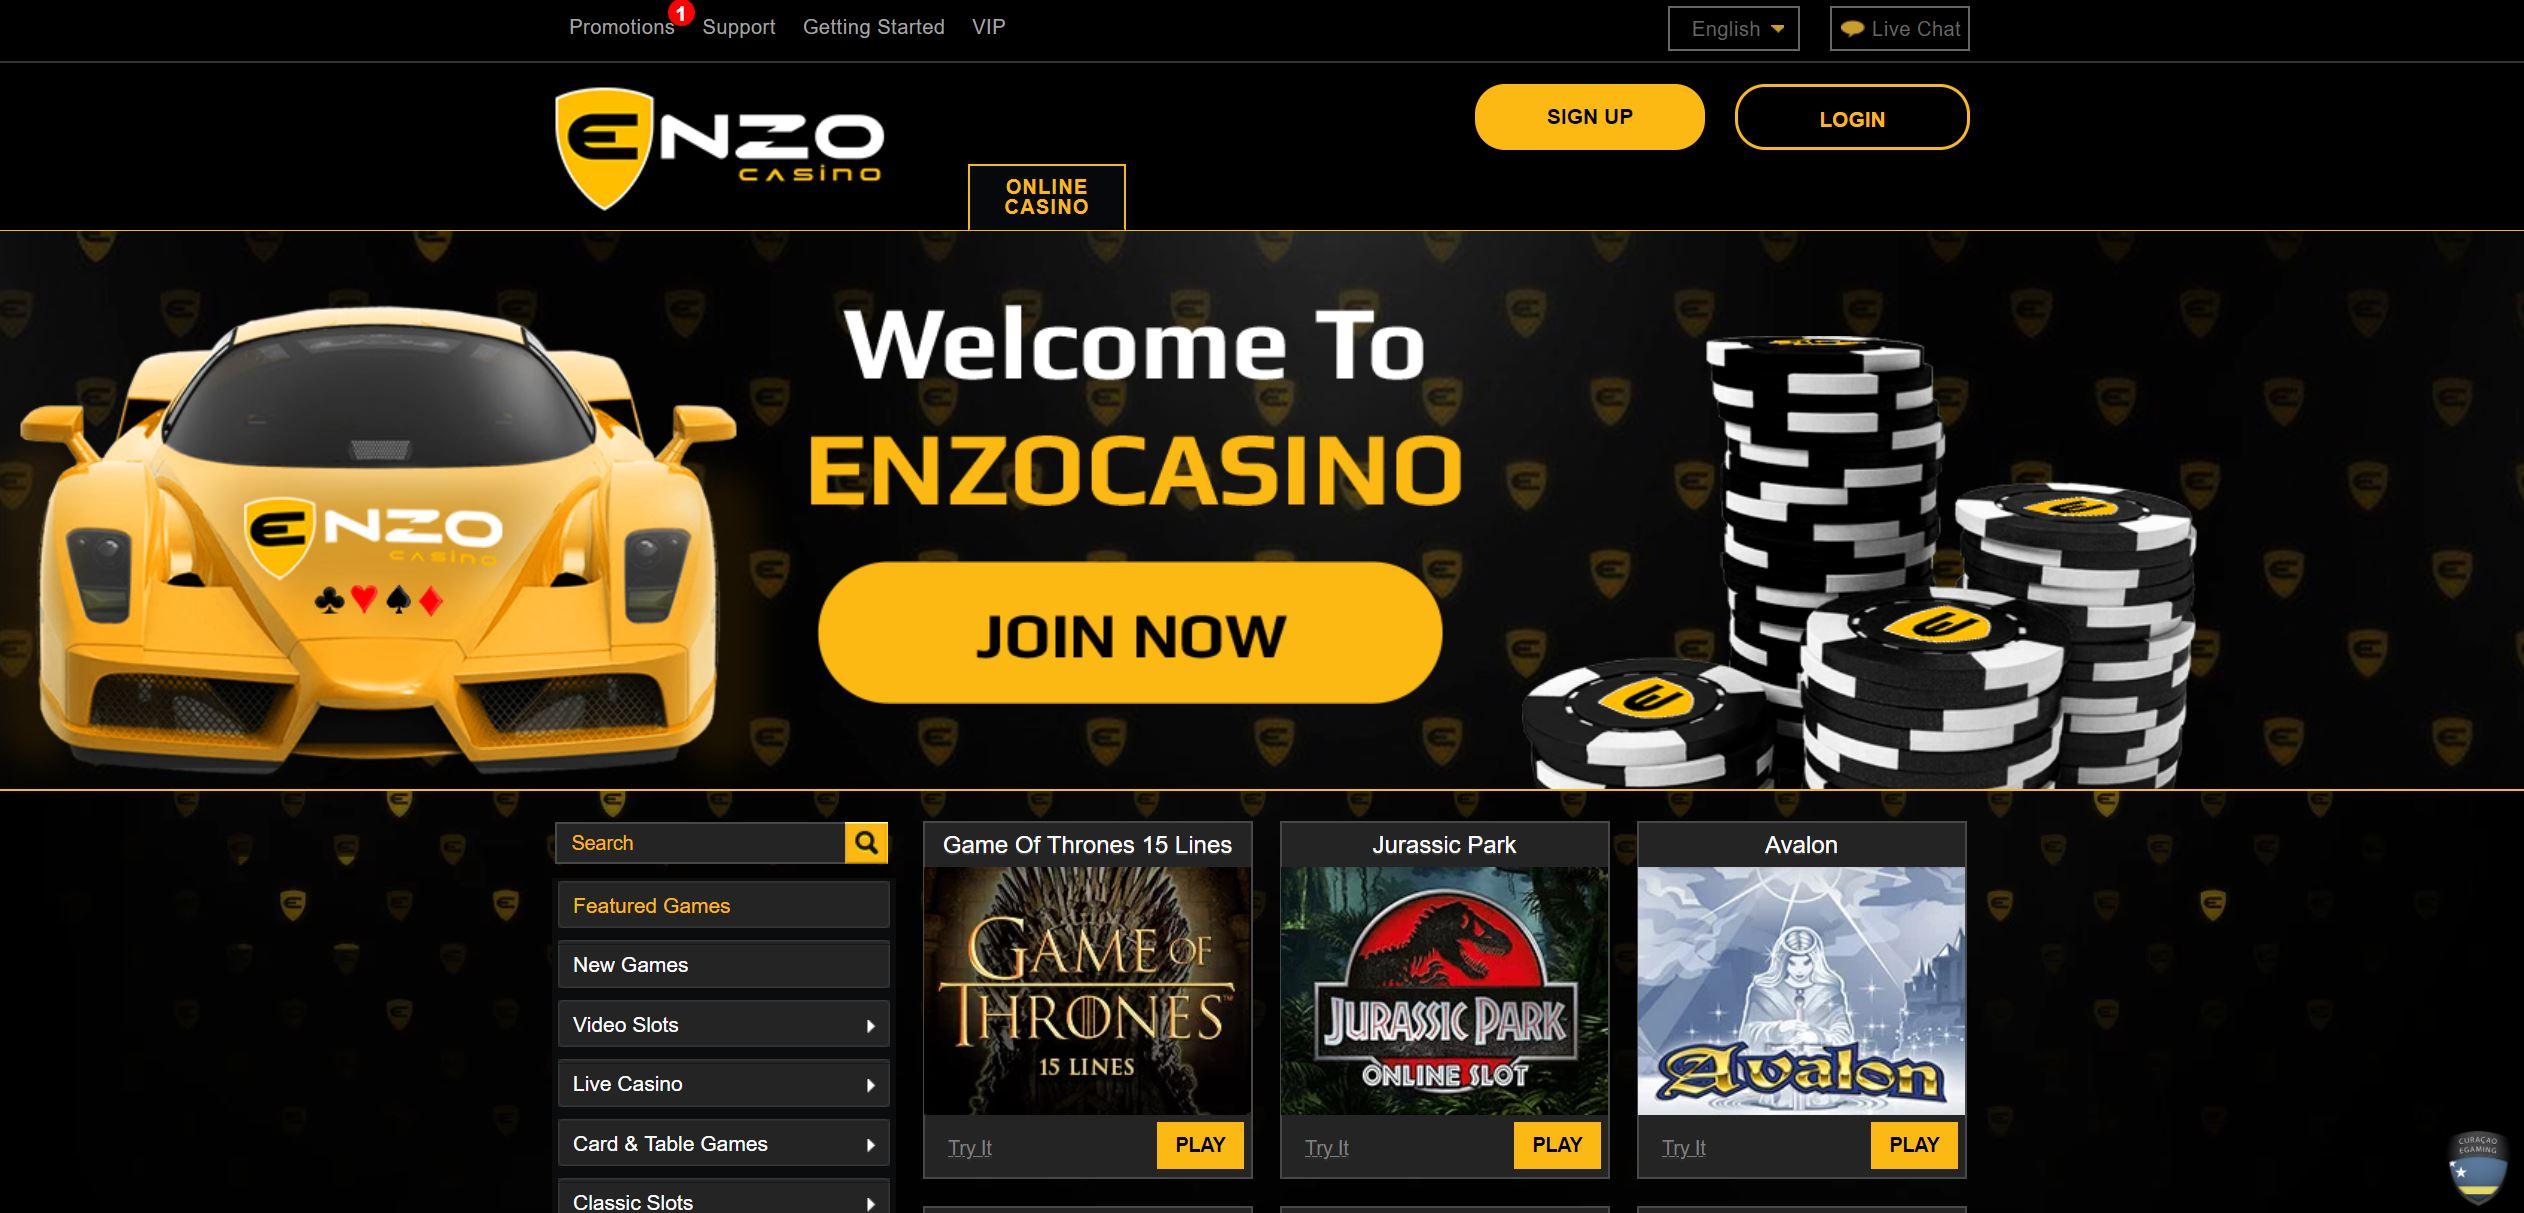 Avis Enzo casino : est-il une arnaque ?